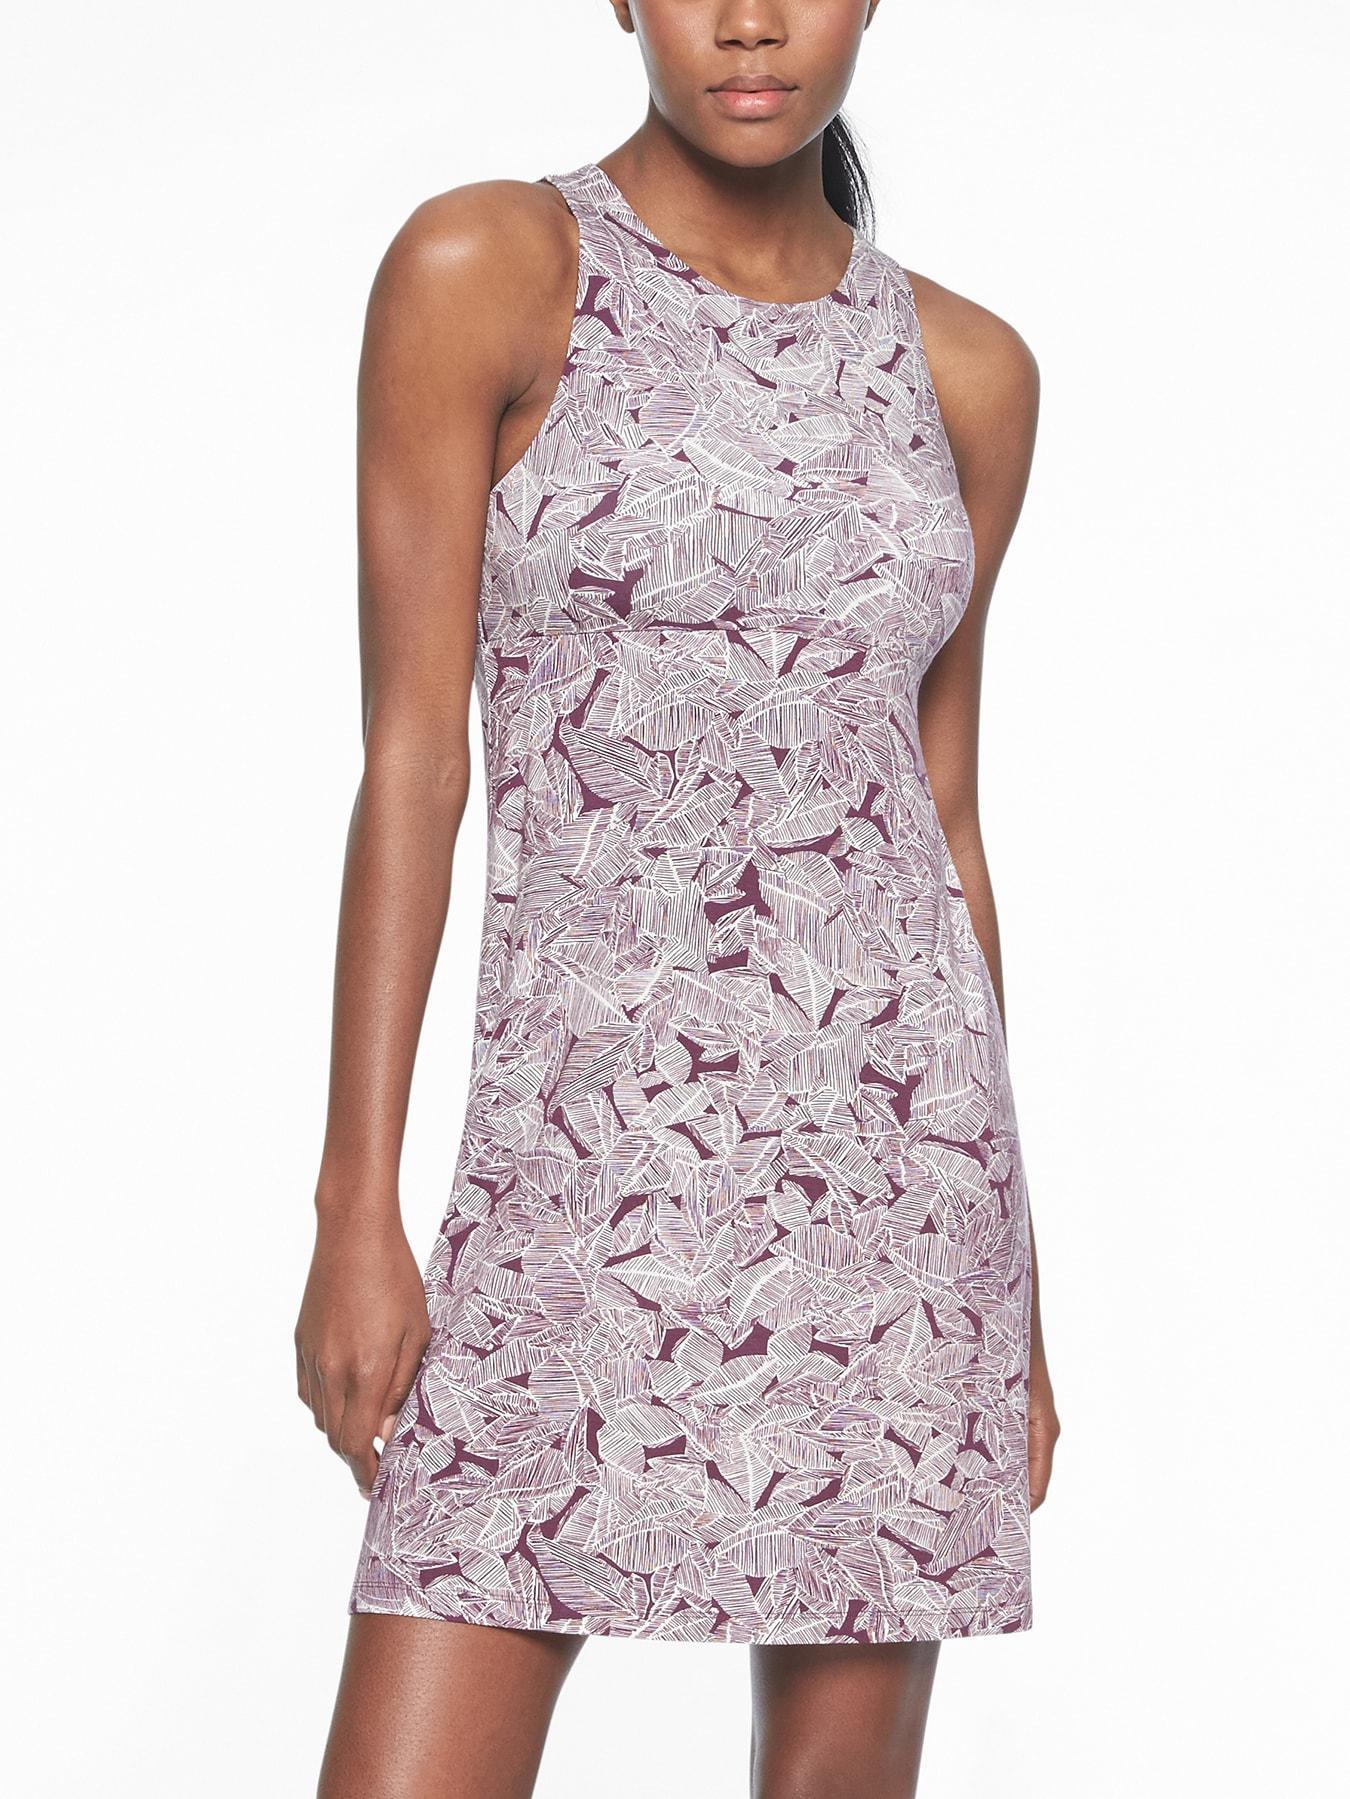 0608b52fce373 Athleta Santorini Printed High Neck Dress - Lyst